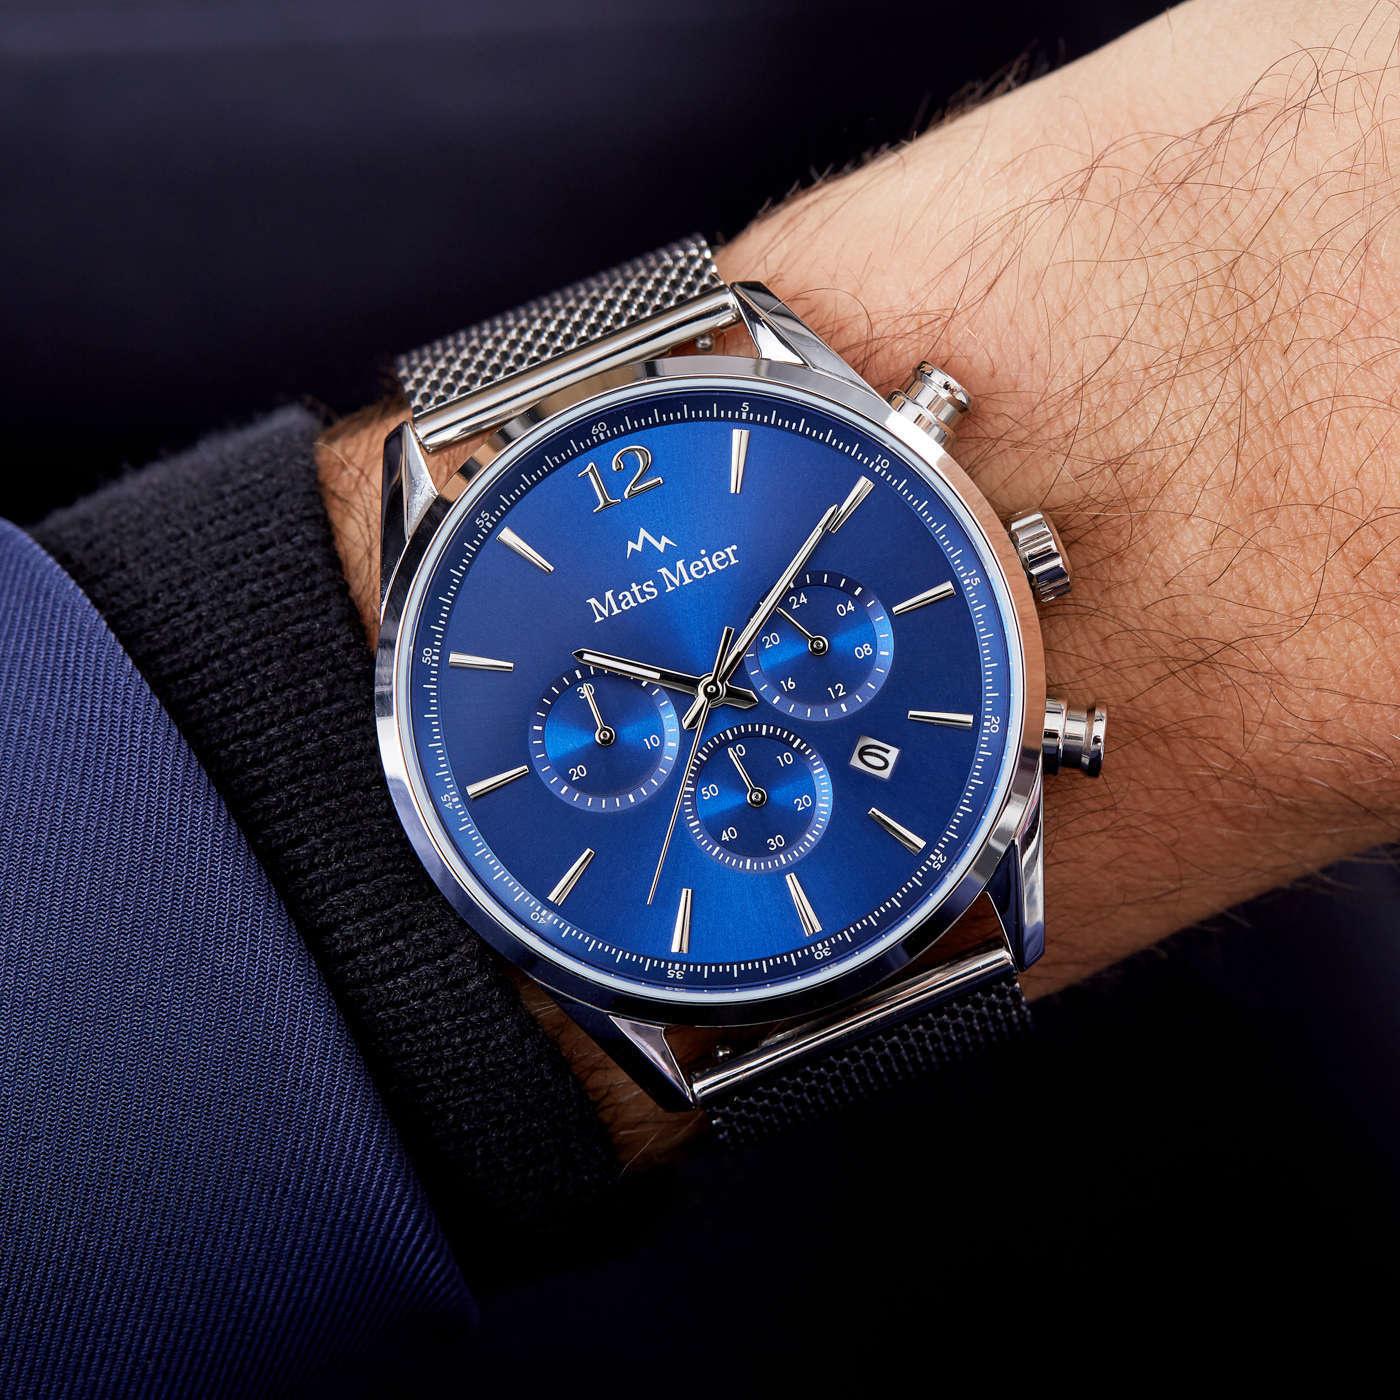 Mats Meier Grand Cornier kronografklocka blå/silvermesh